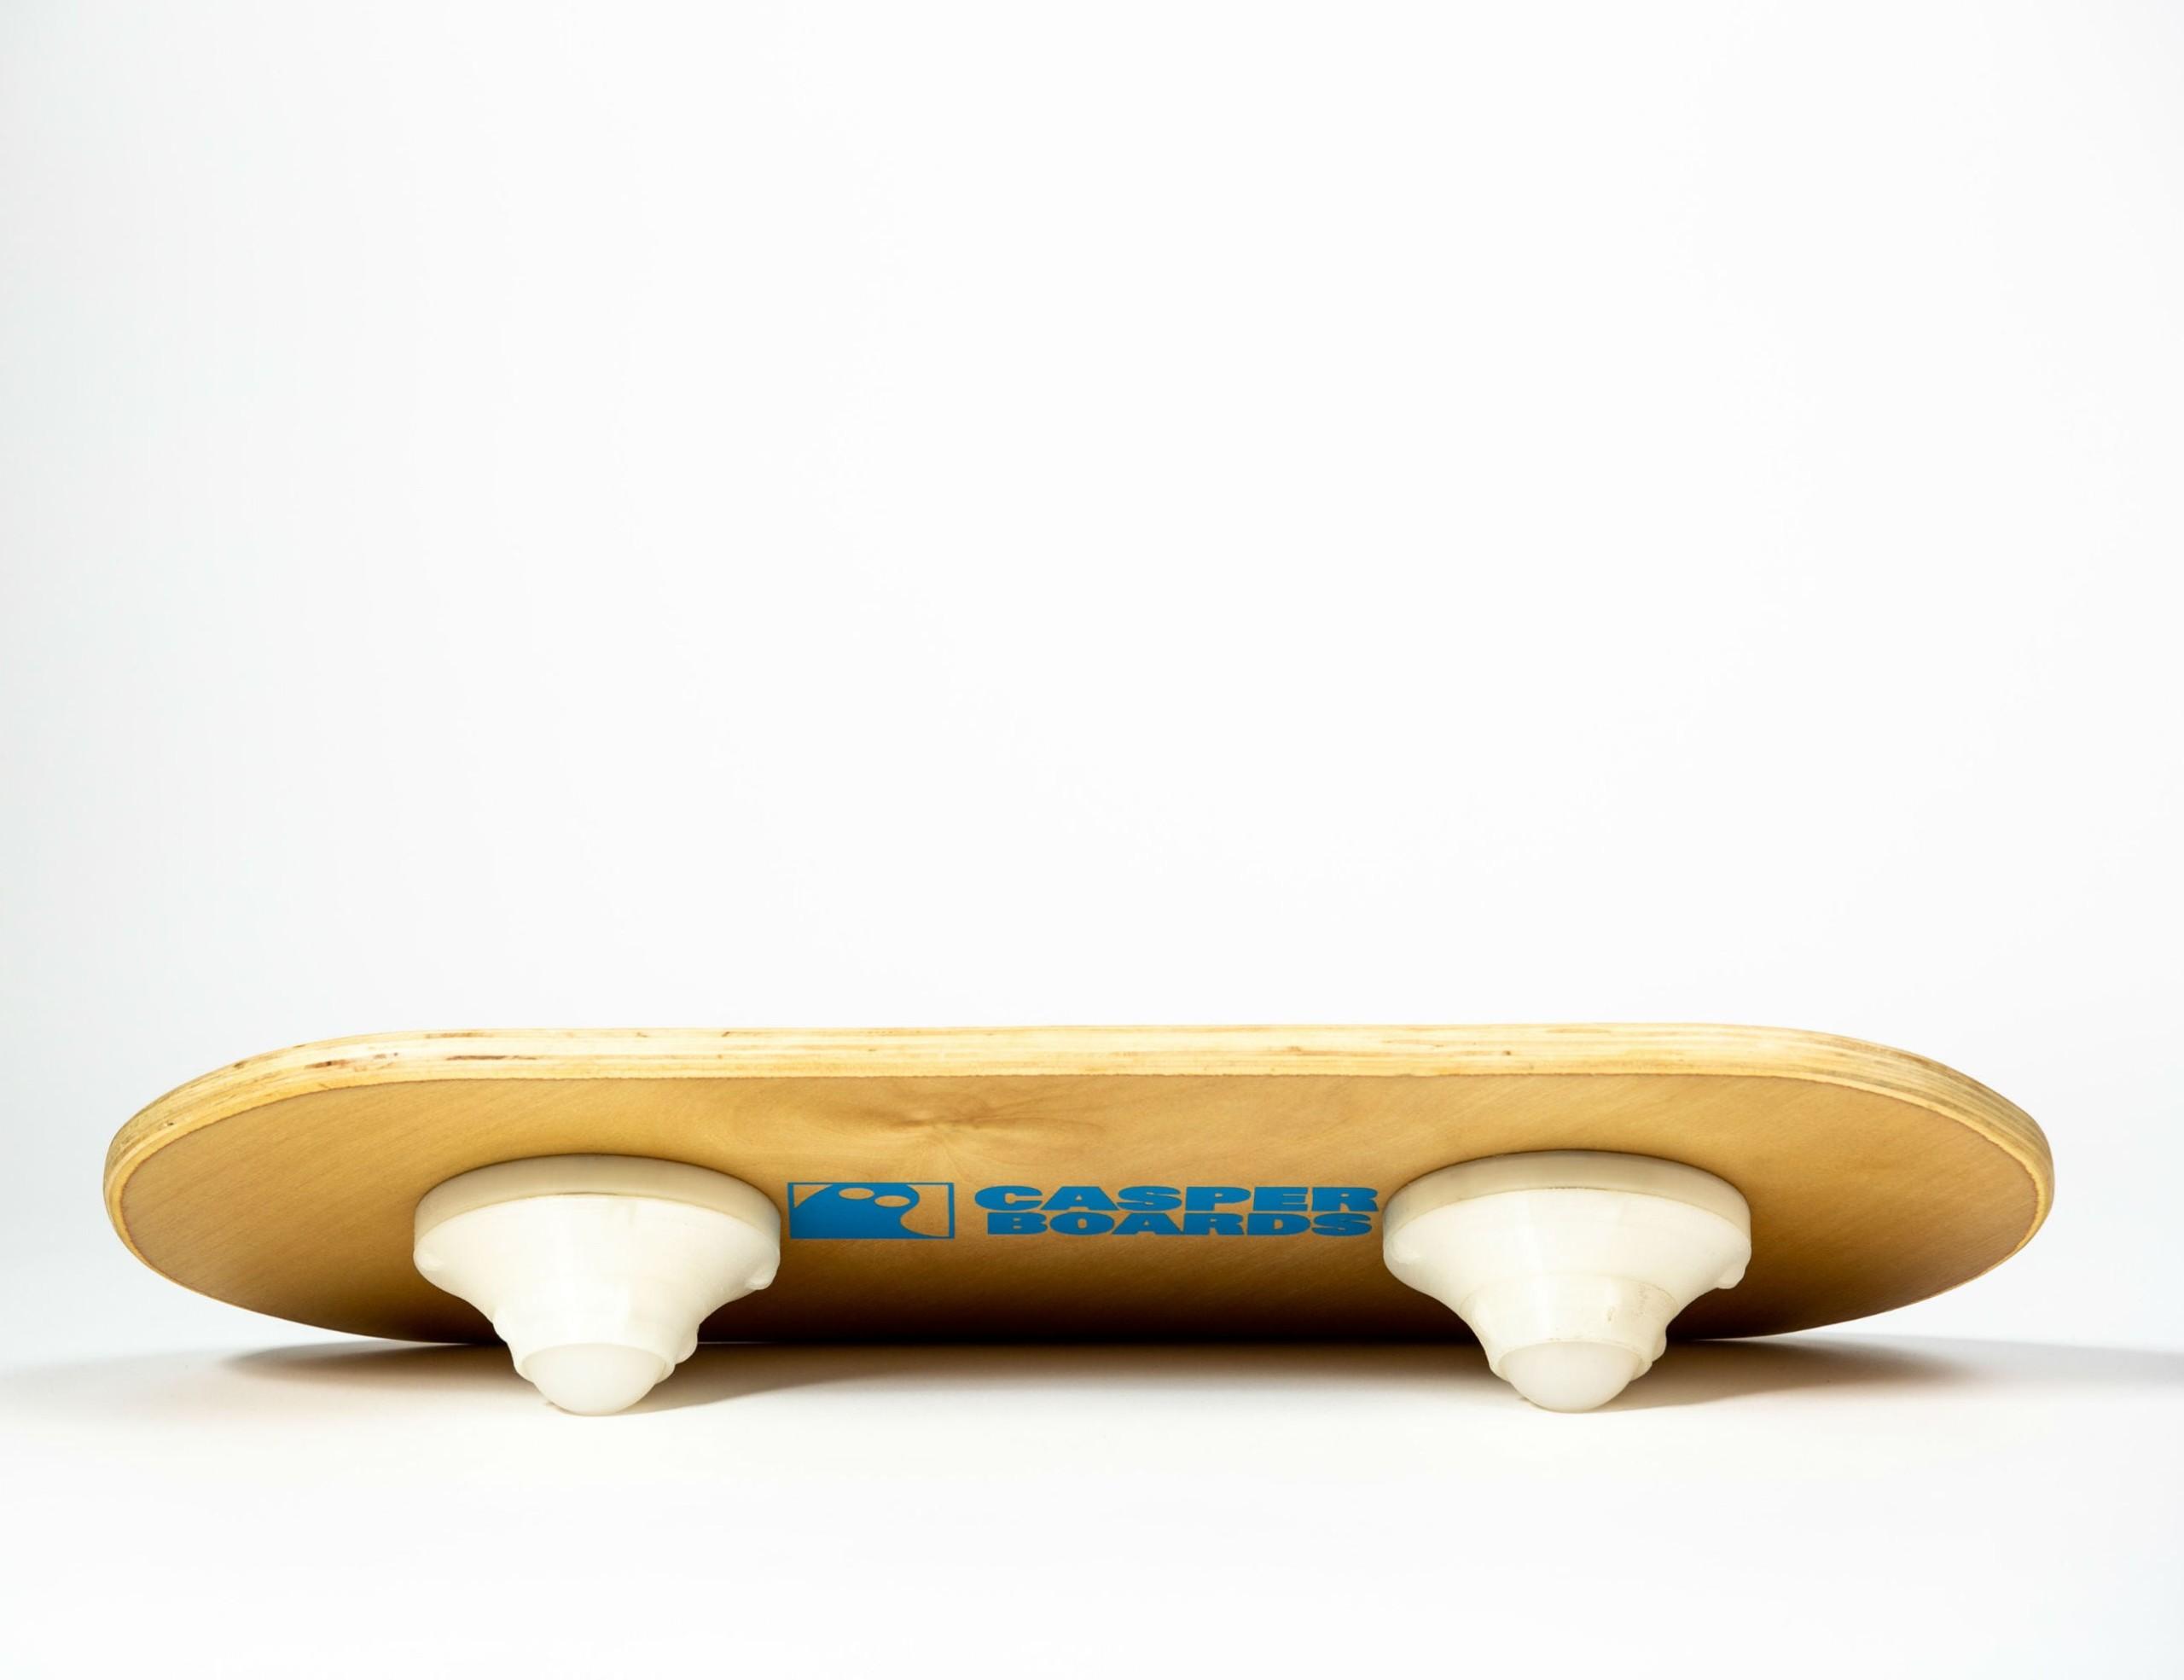 Casper Boards 2-in-1 Active Footrest